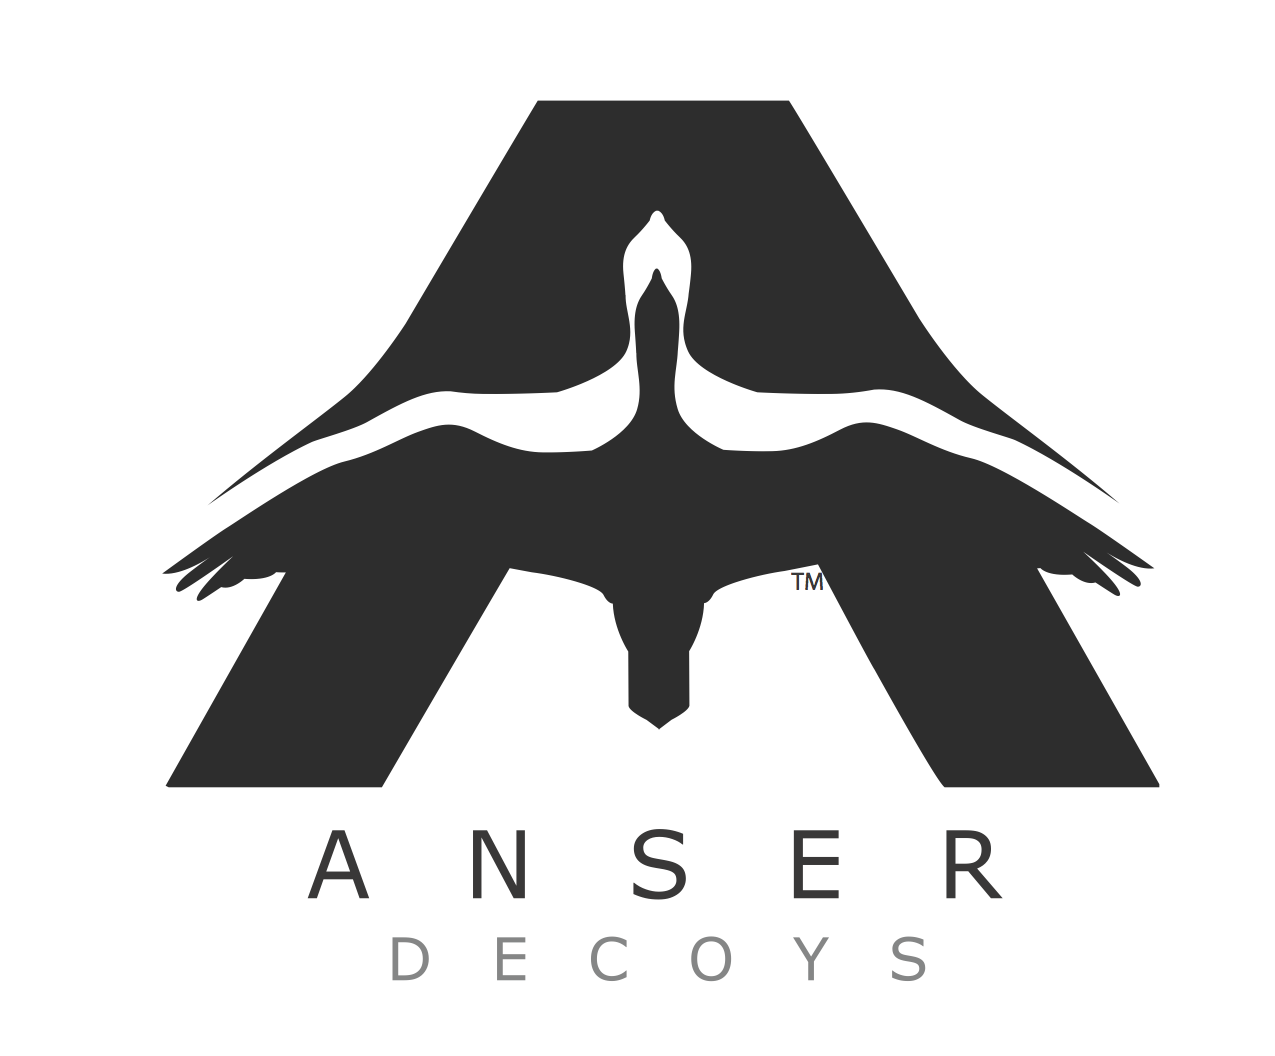 Anser Decoys